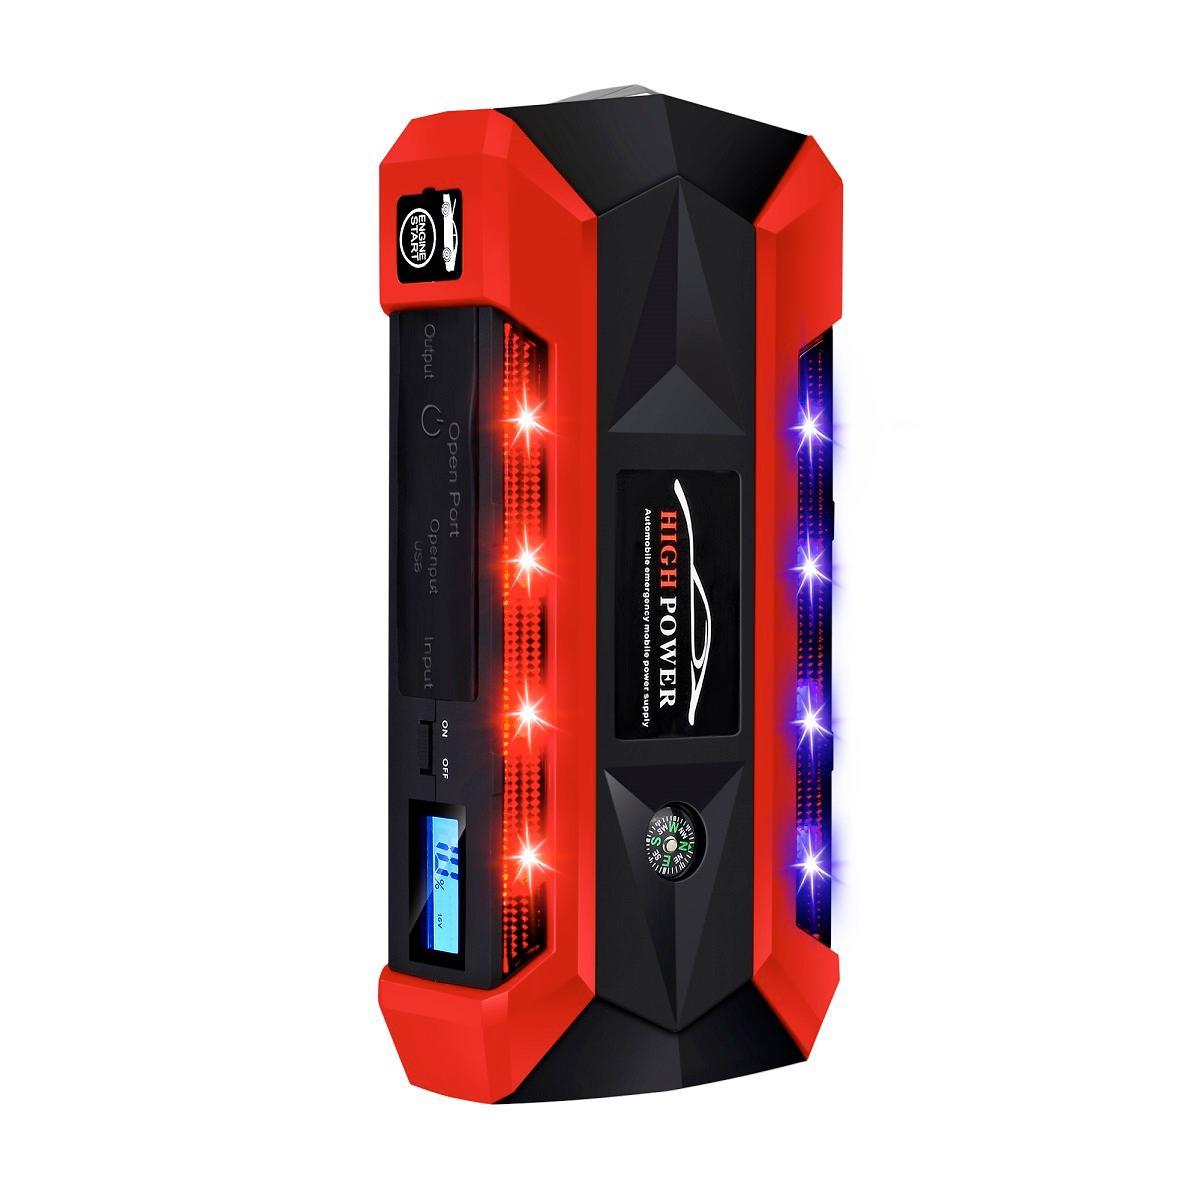 4usb power bank 12v dispositivo de partida